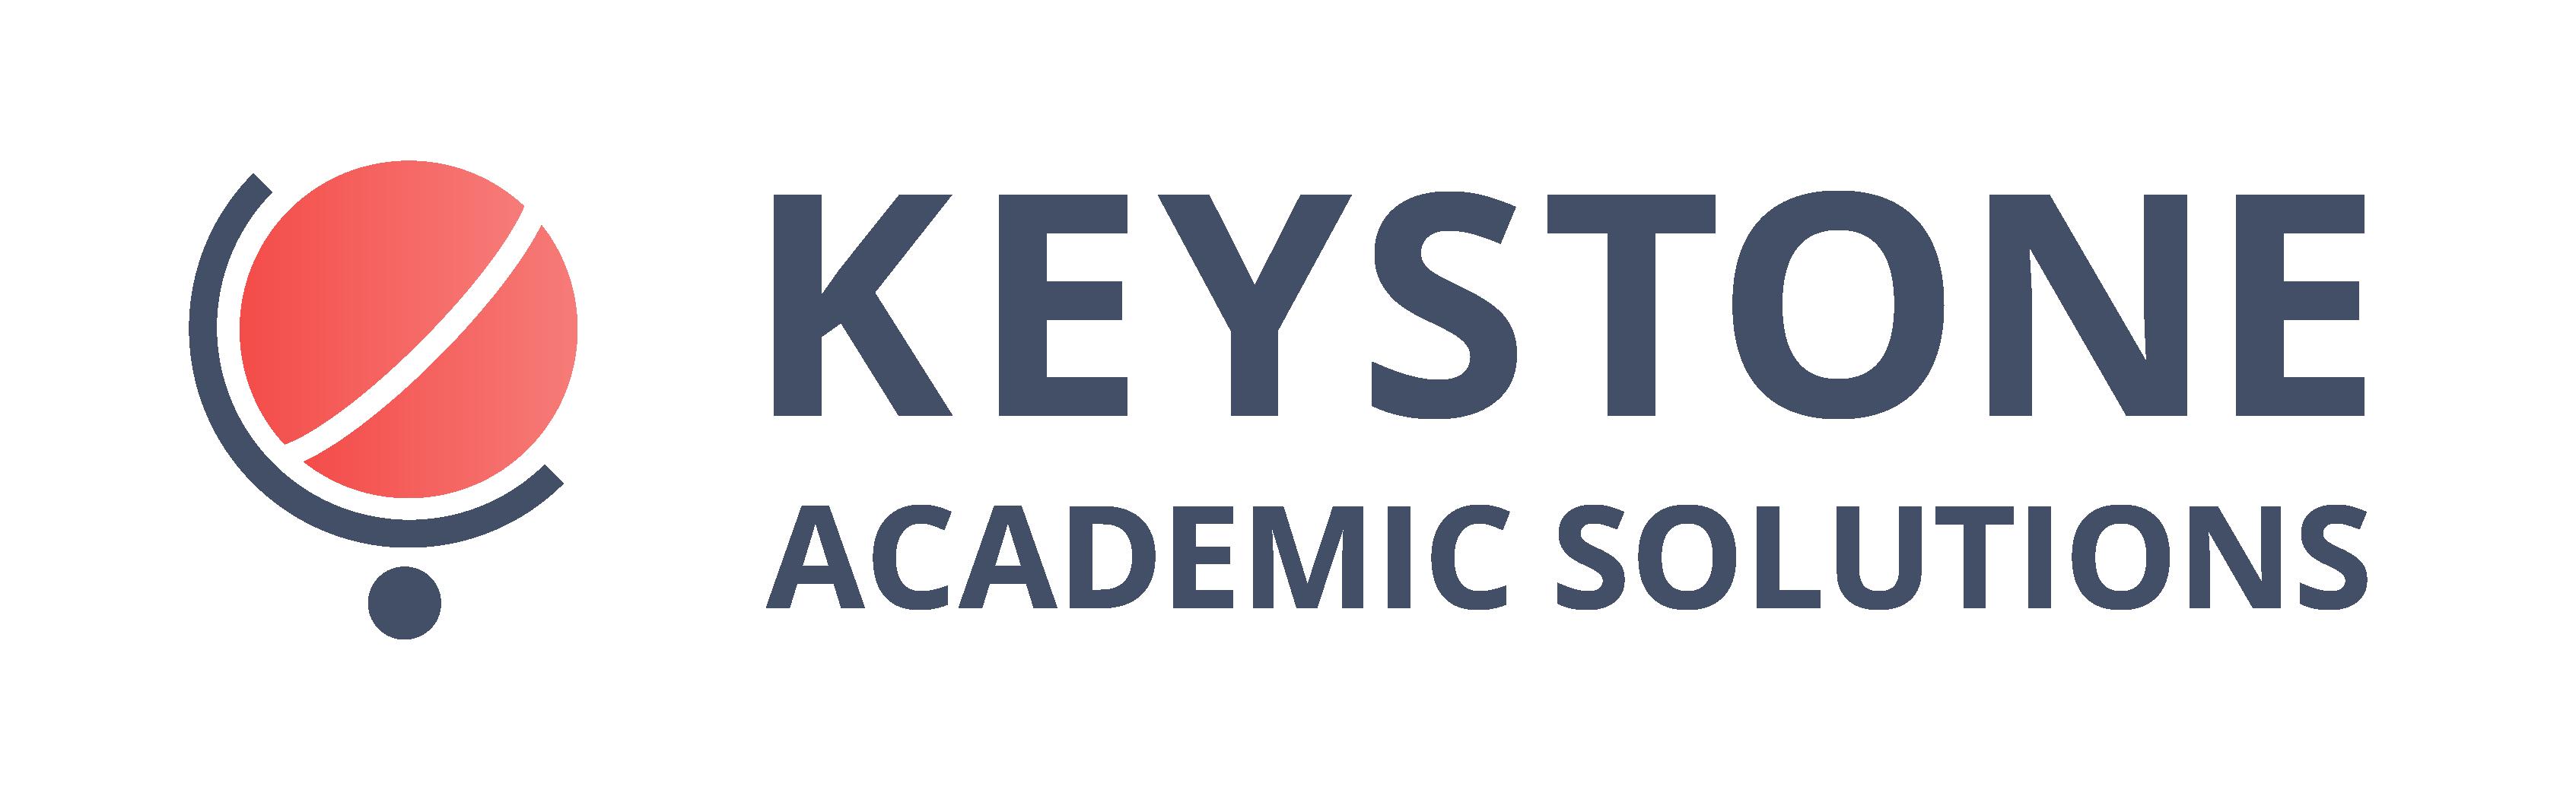 Keystone_Logos-05